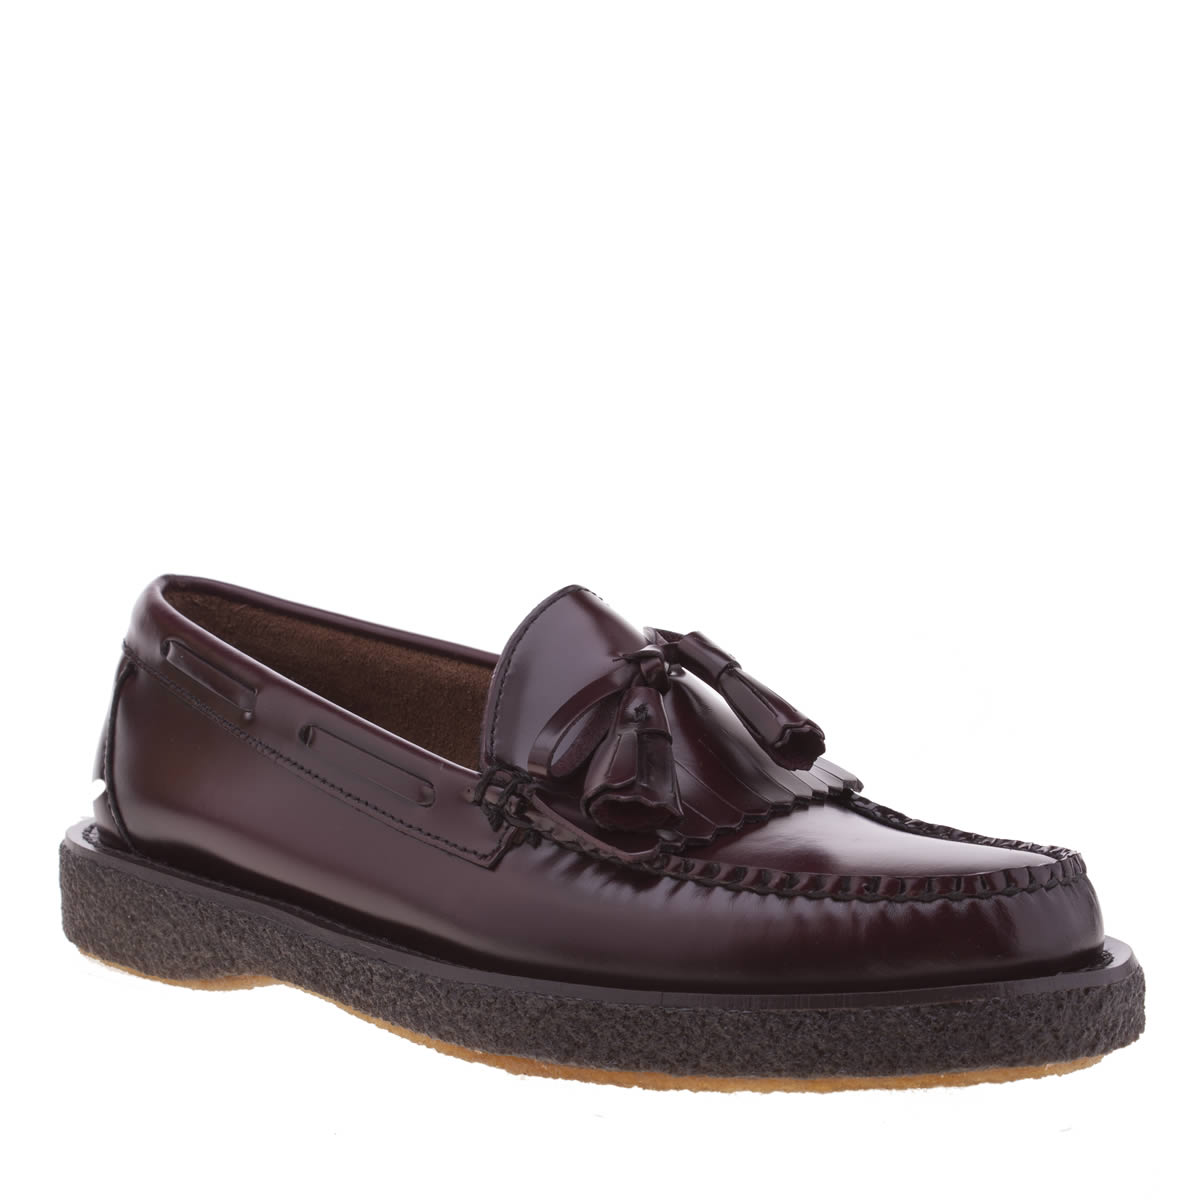 bass Bass Burgundy Layton Moc Kiltie Crepe Shoes